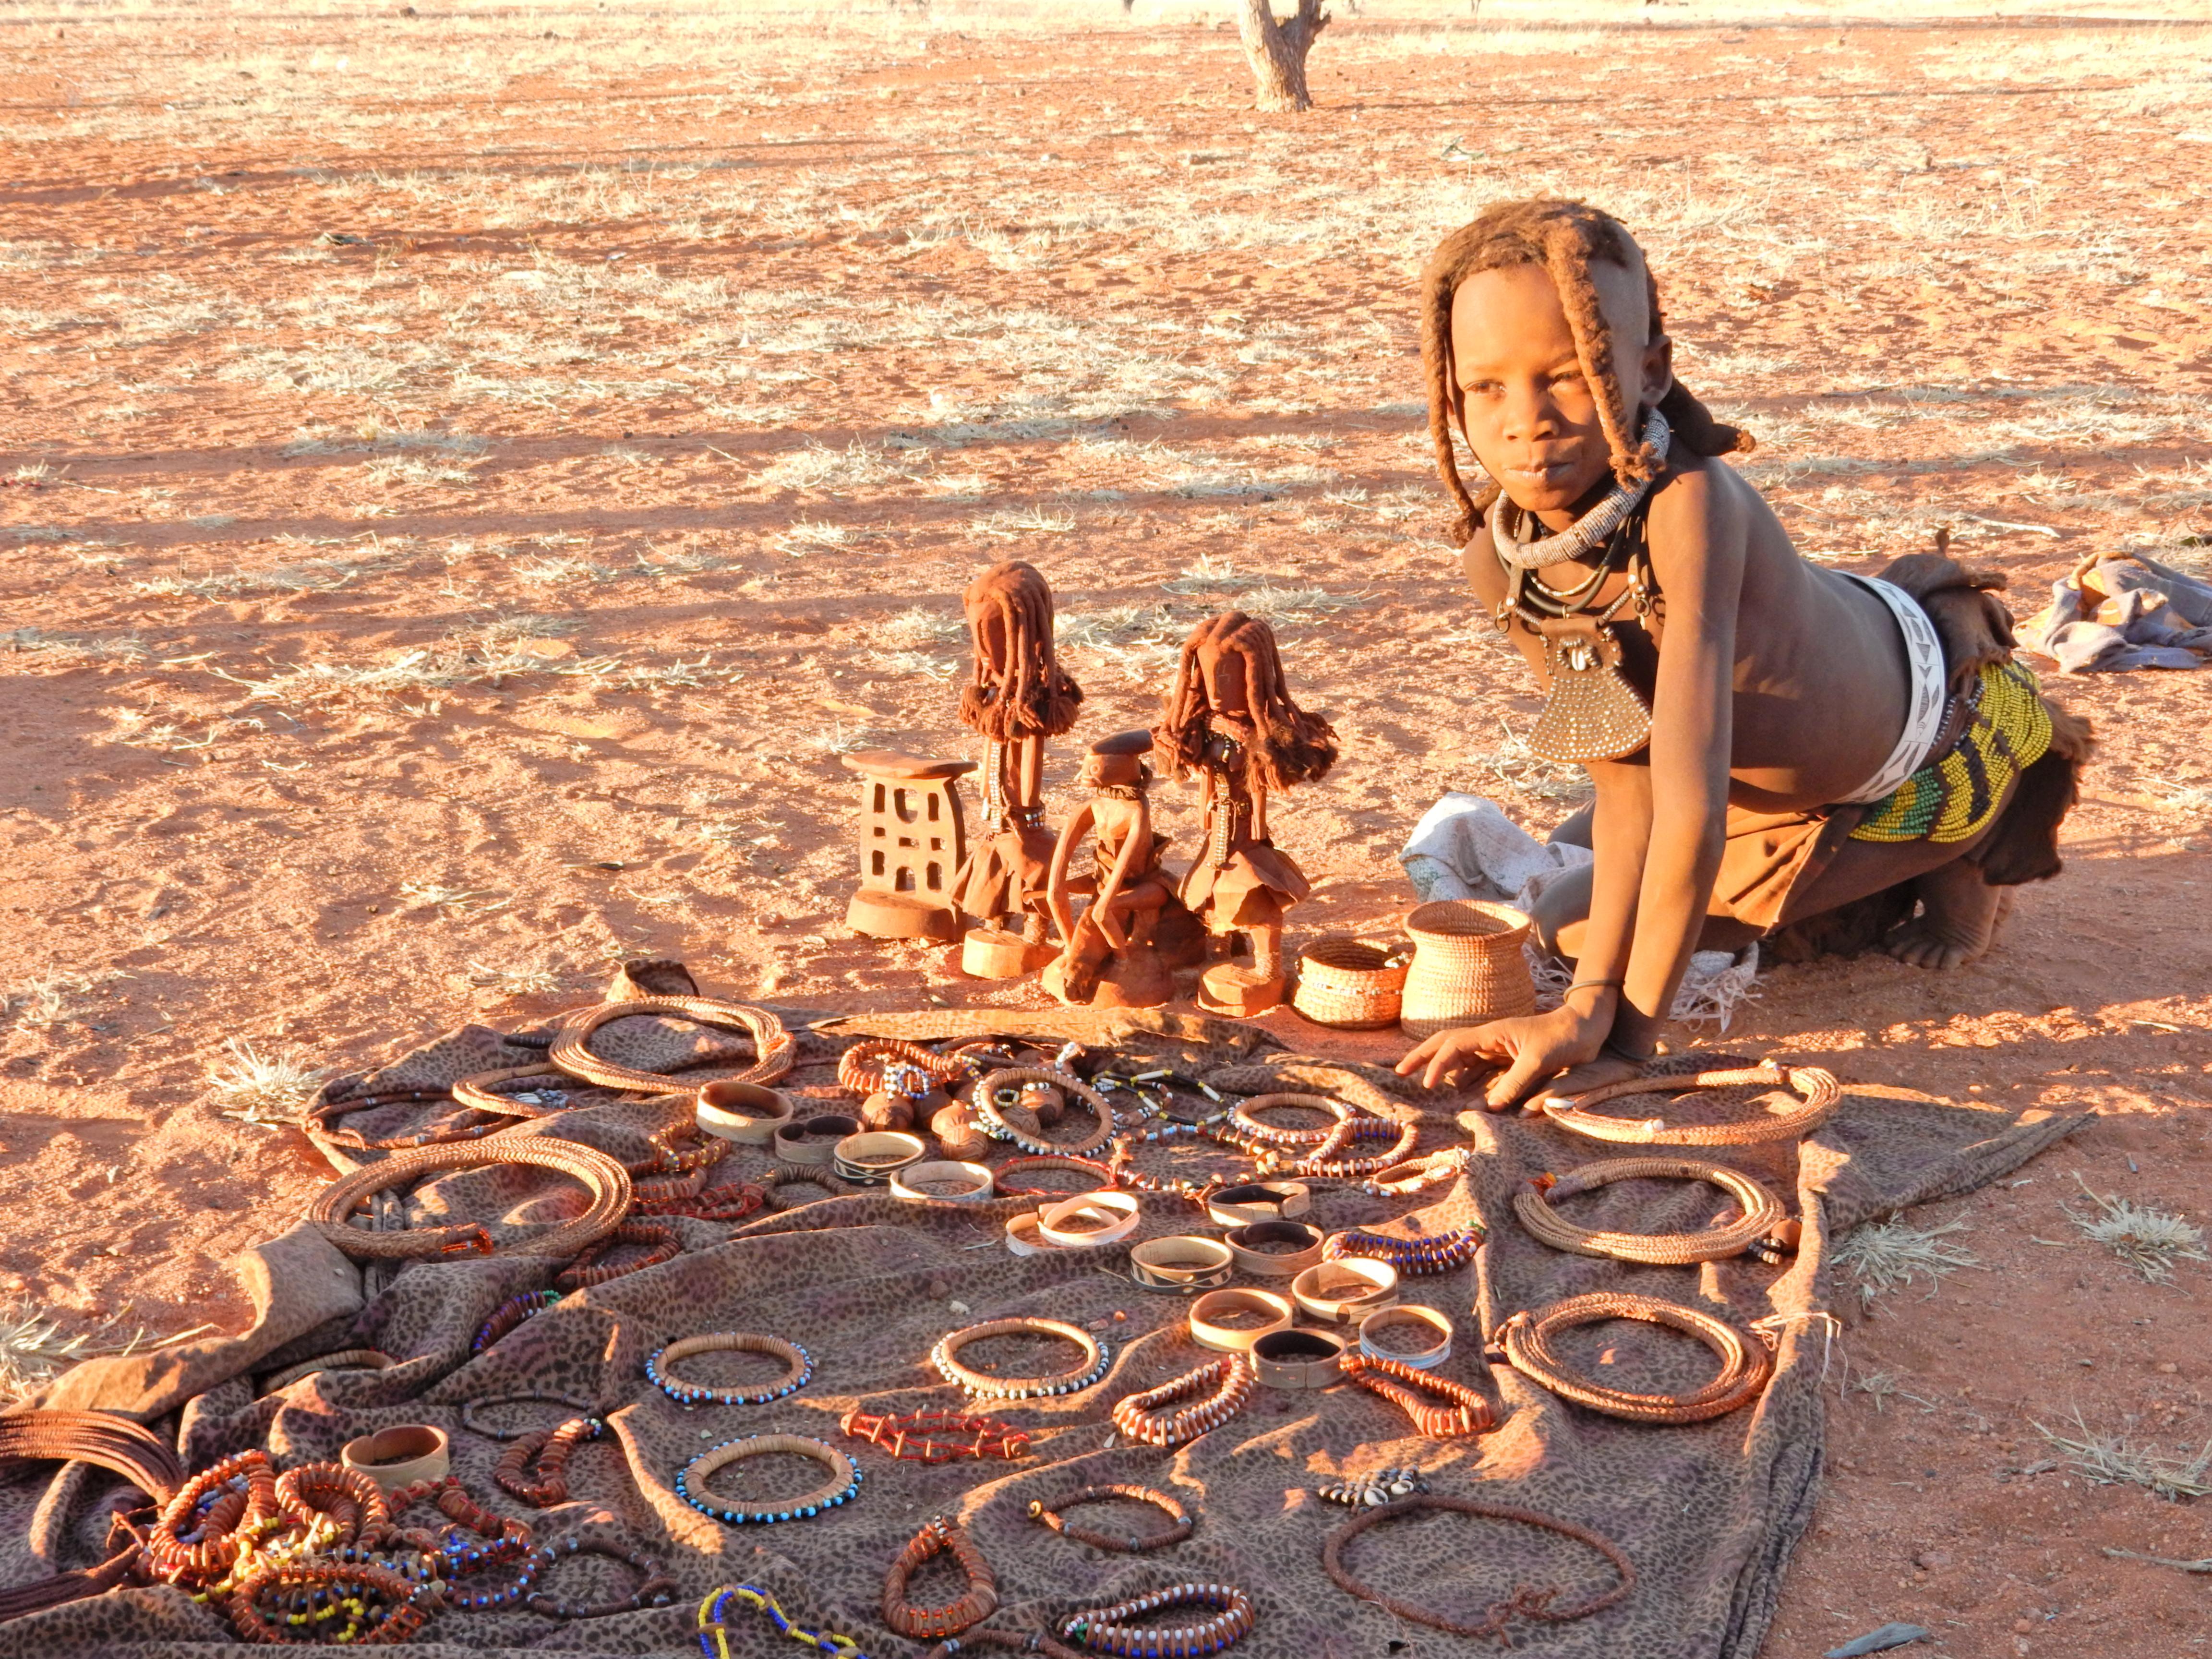 DSCN1275 Visite dun village Himba